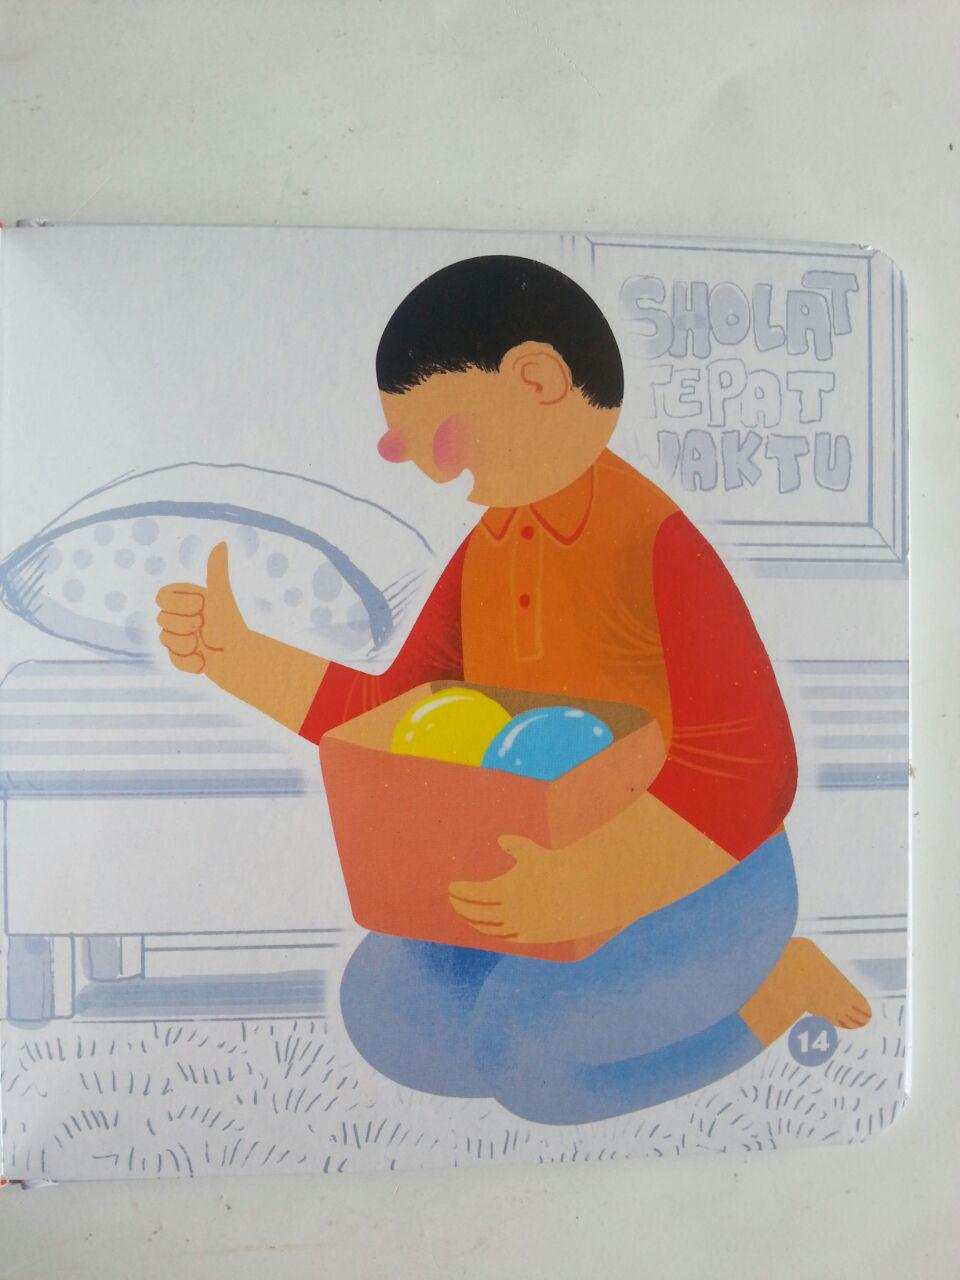 Buku Anak Boarbook Kakak Tercinta isi 2